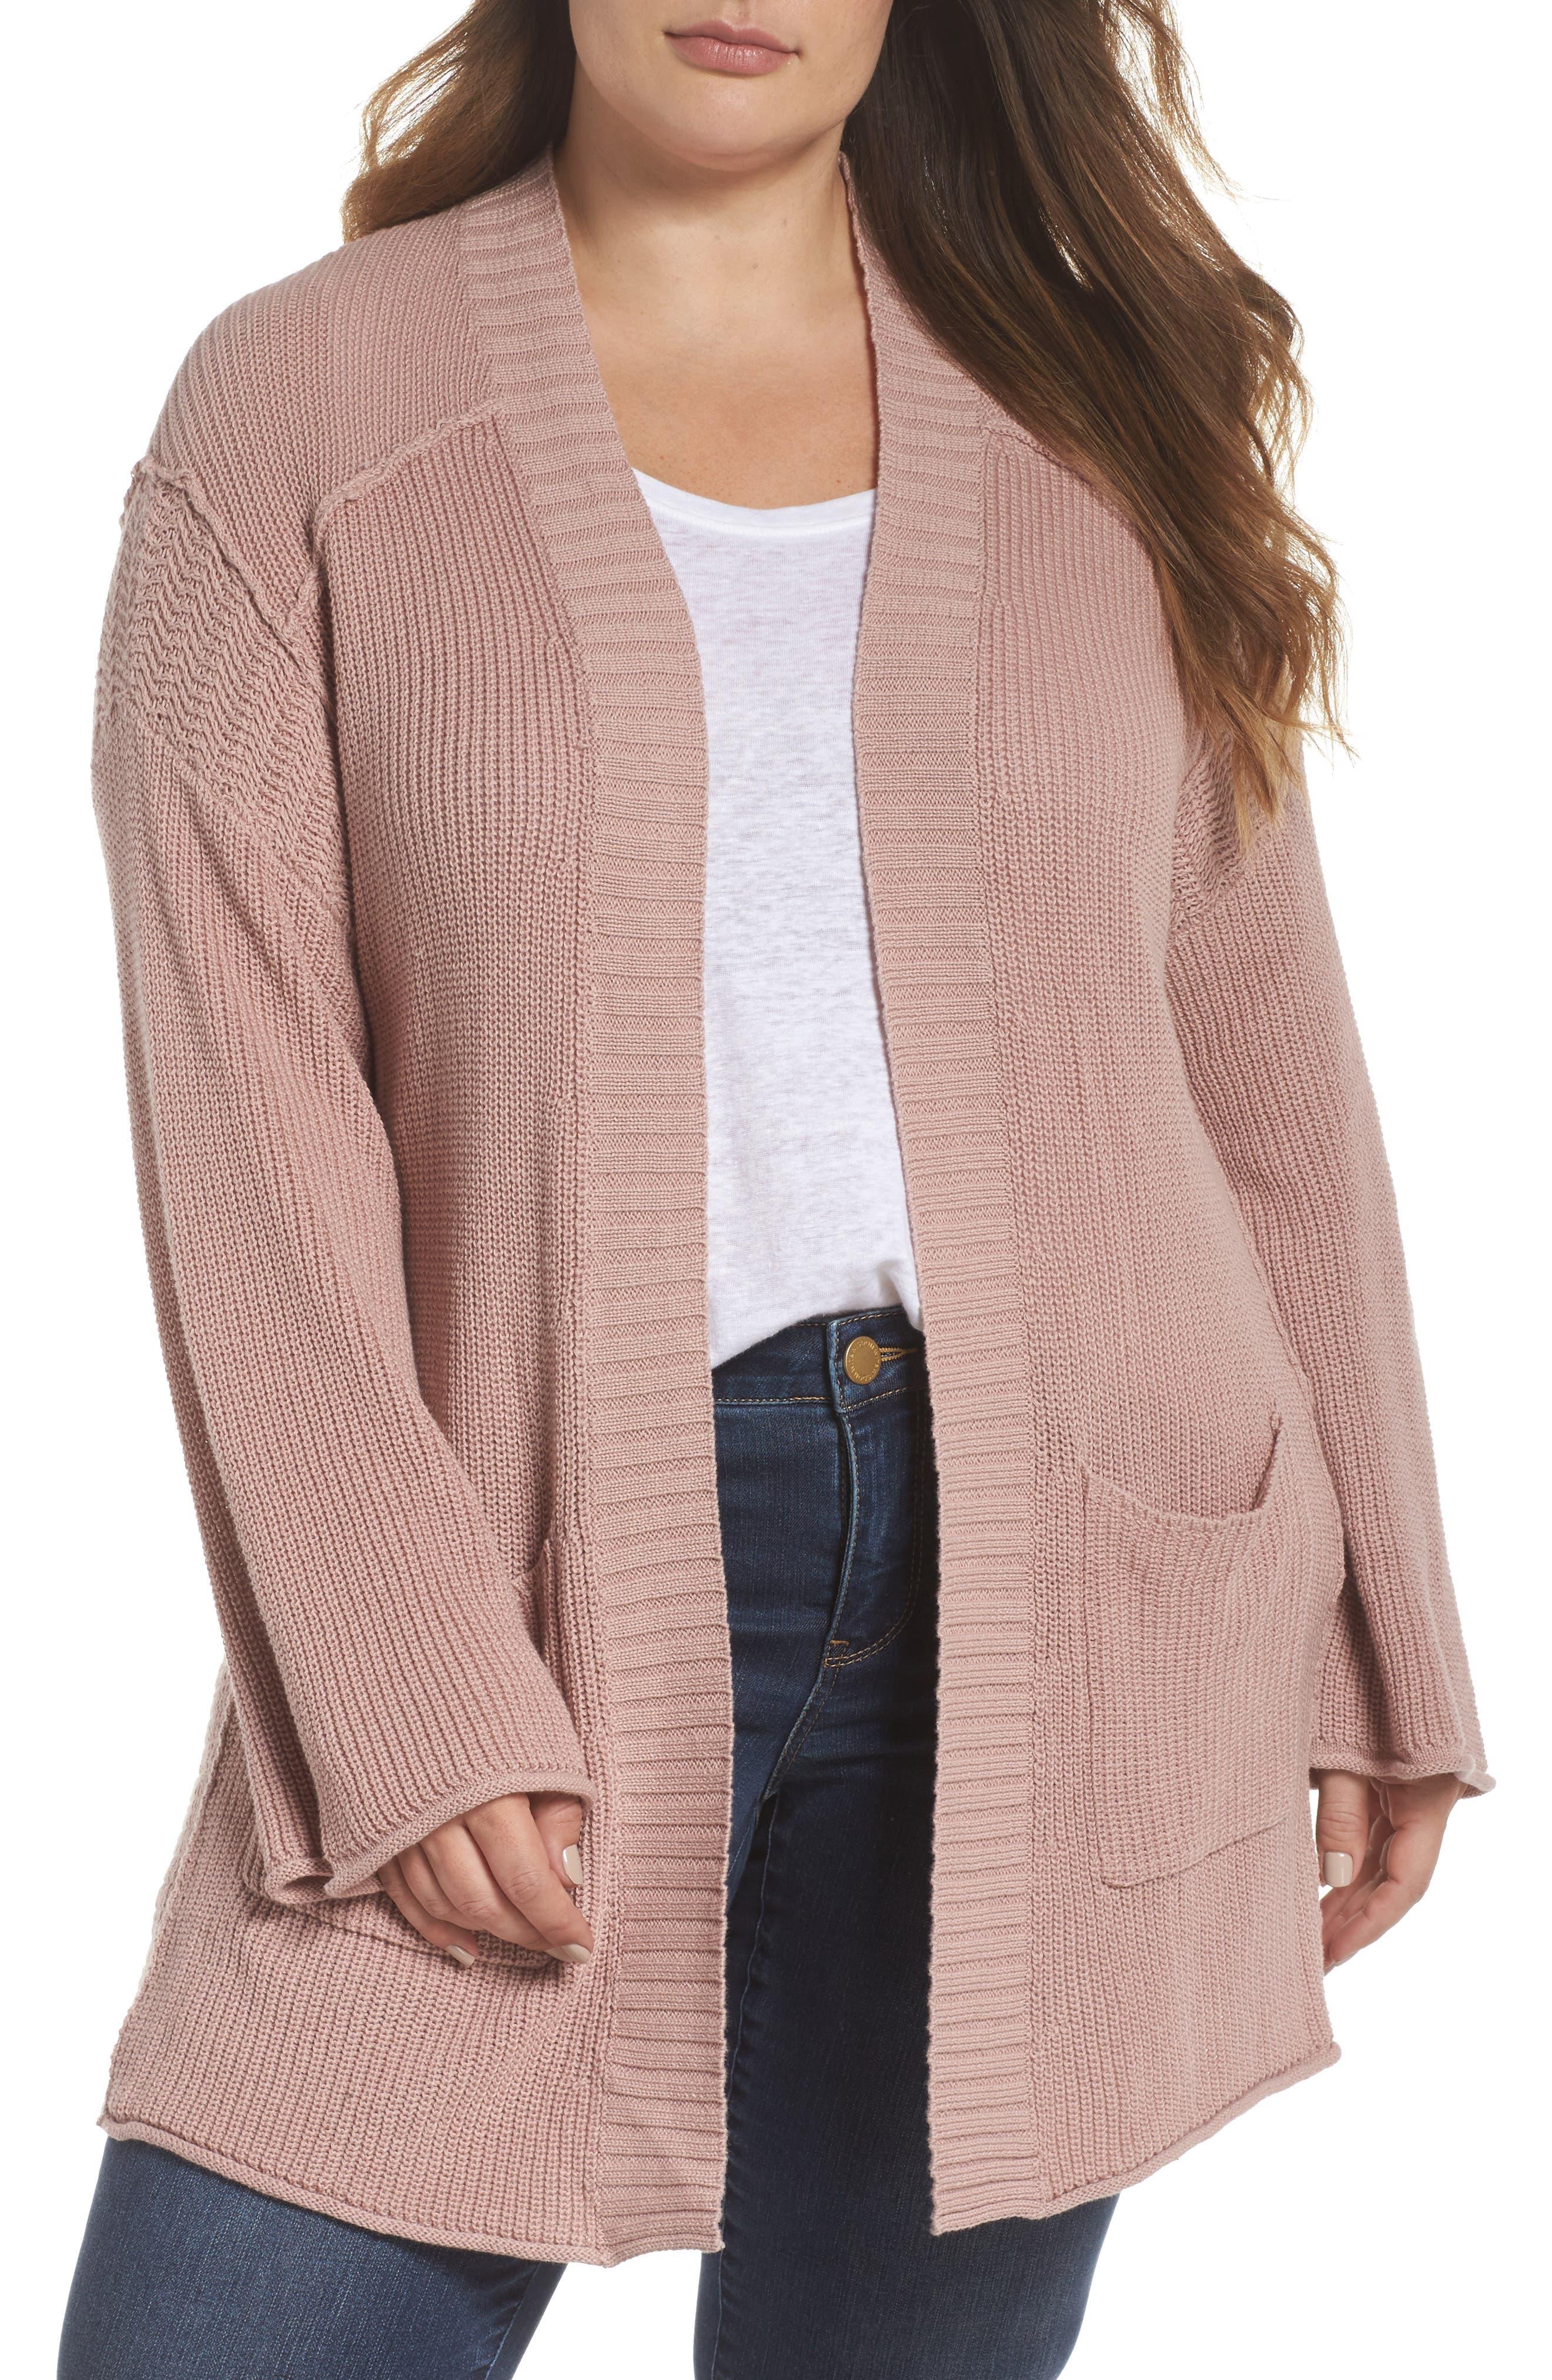 Sweater Knit Cardigan,                             Main thumbnail 1, color,                             Pink Adobe